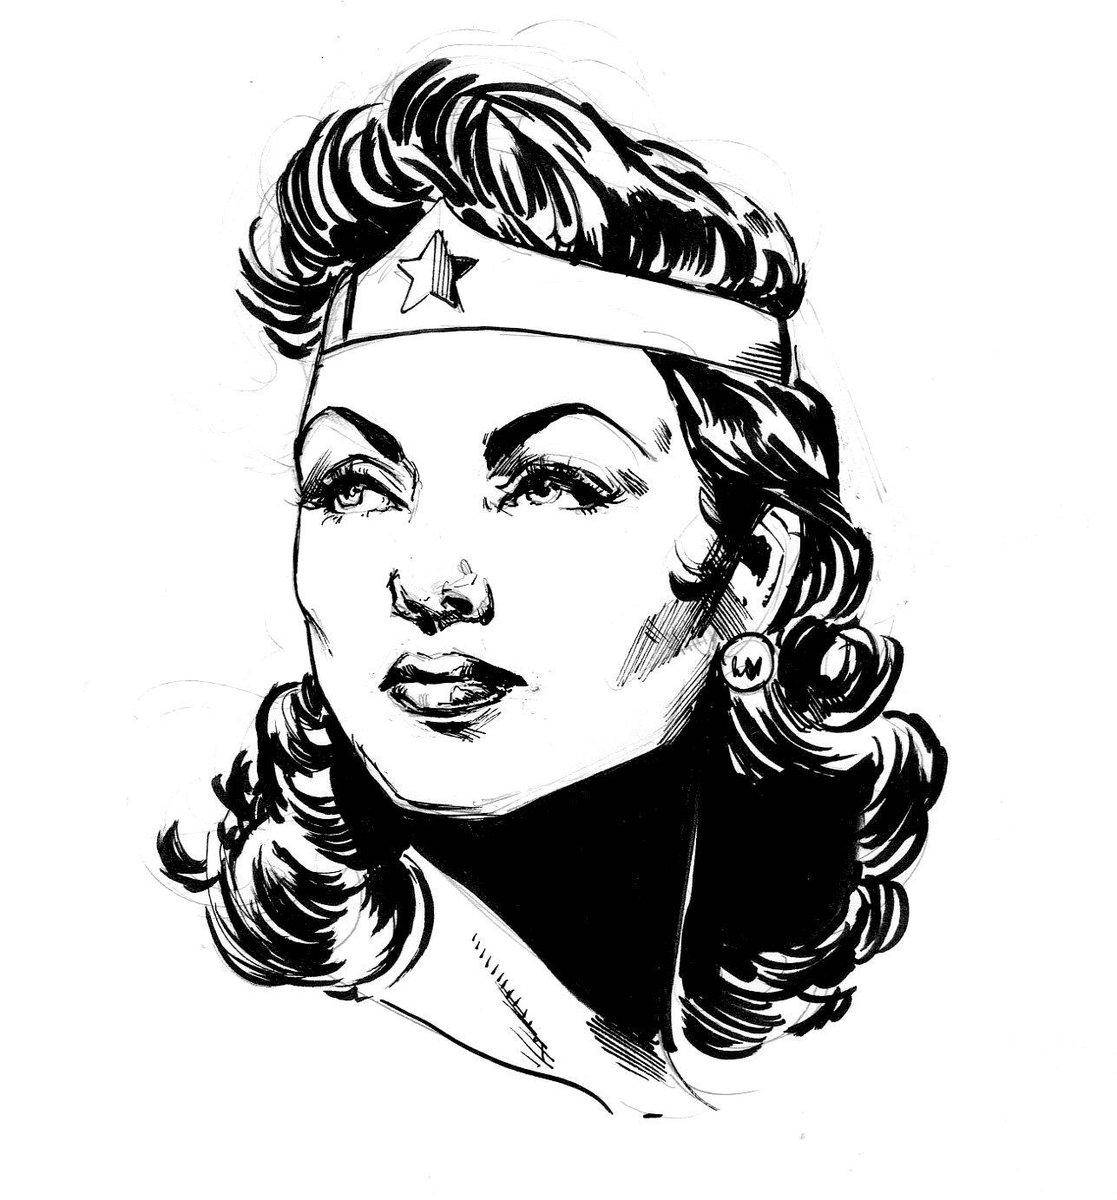 woman-head-sketch-23